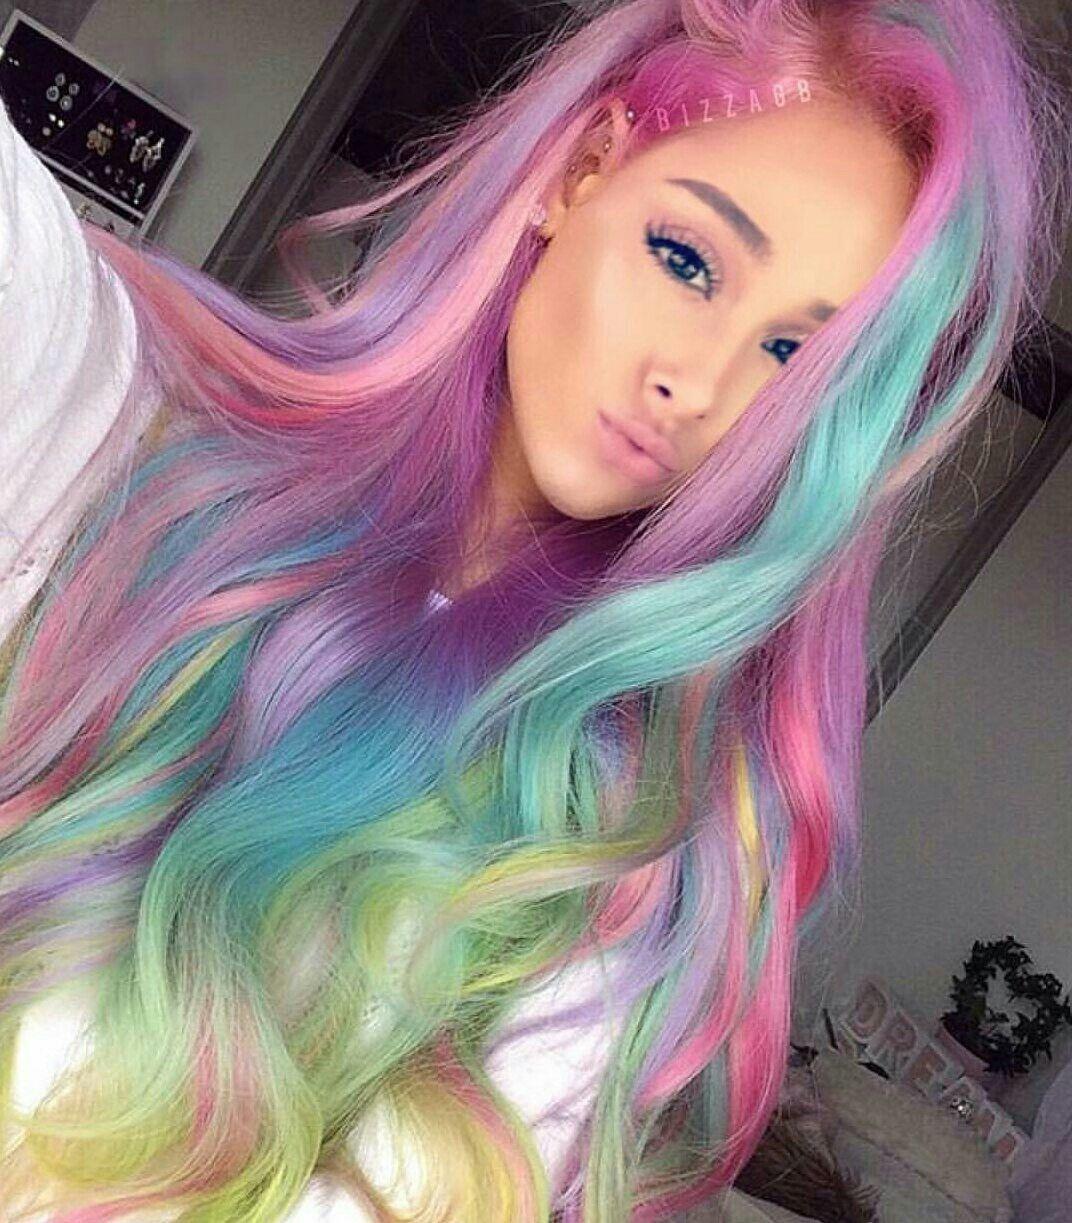 colorful hair love ari ariana